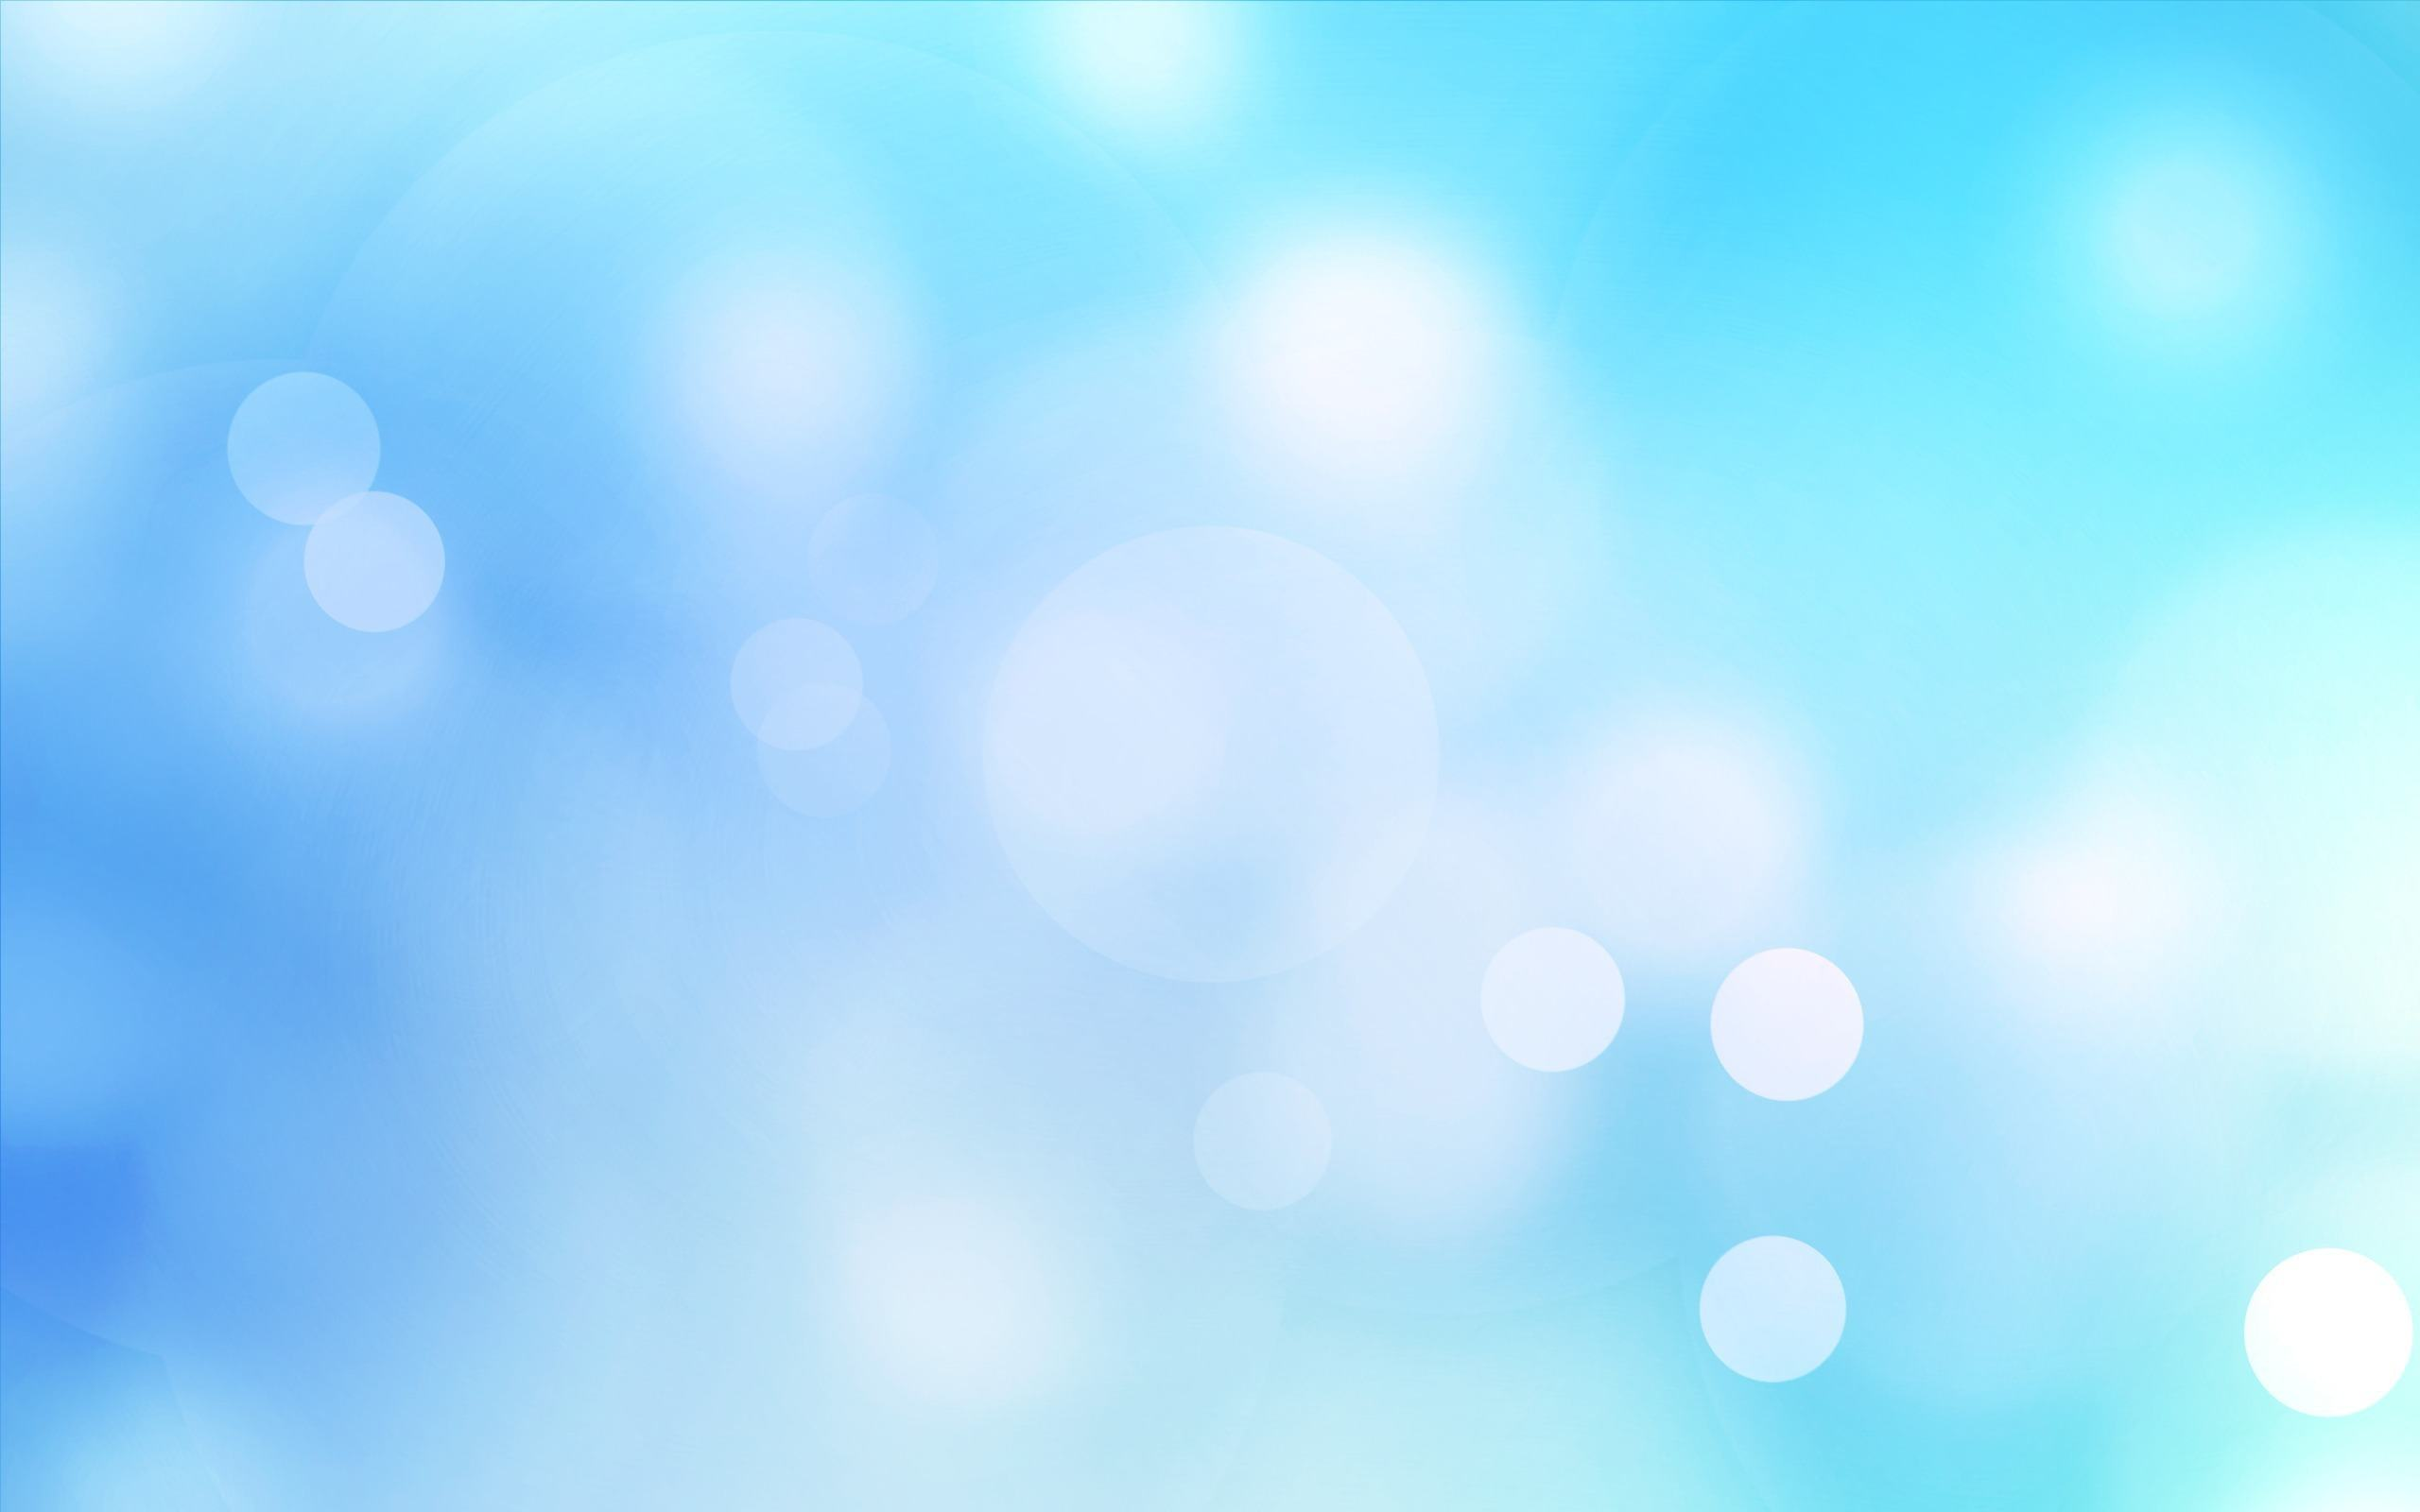 High Resolution Wallpaper | Background 2560x1600 px